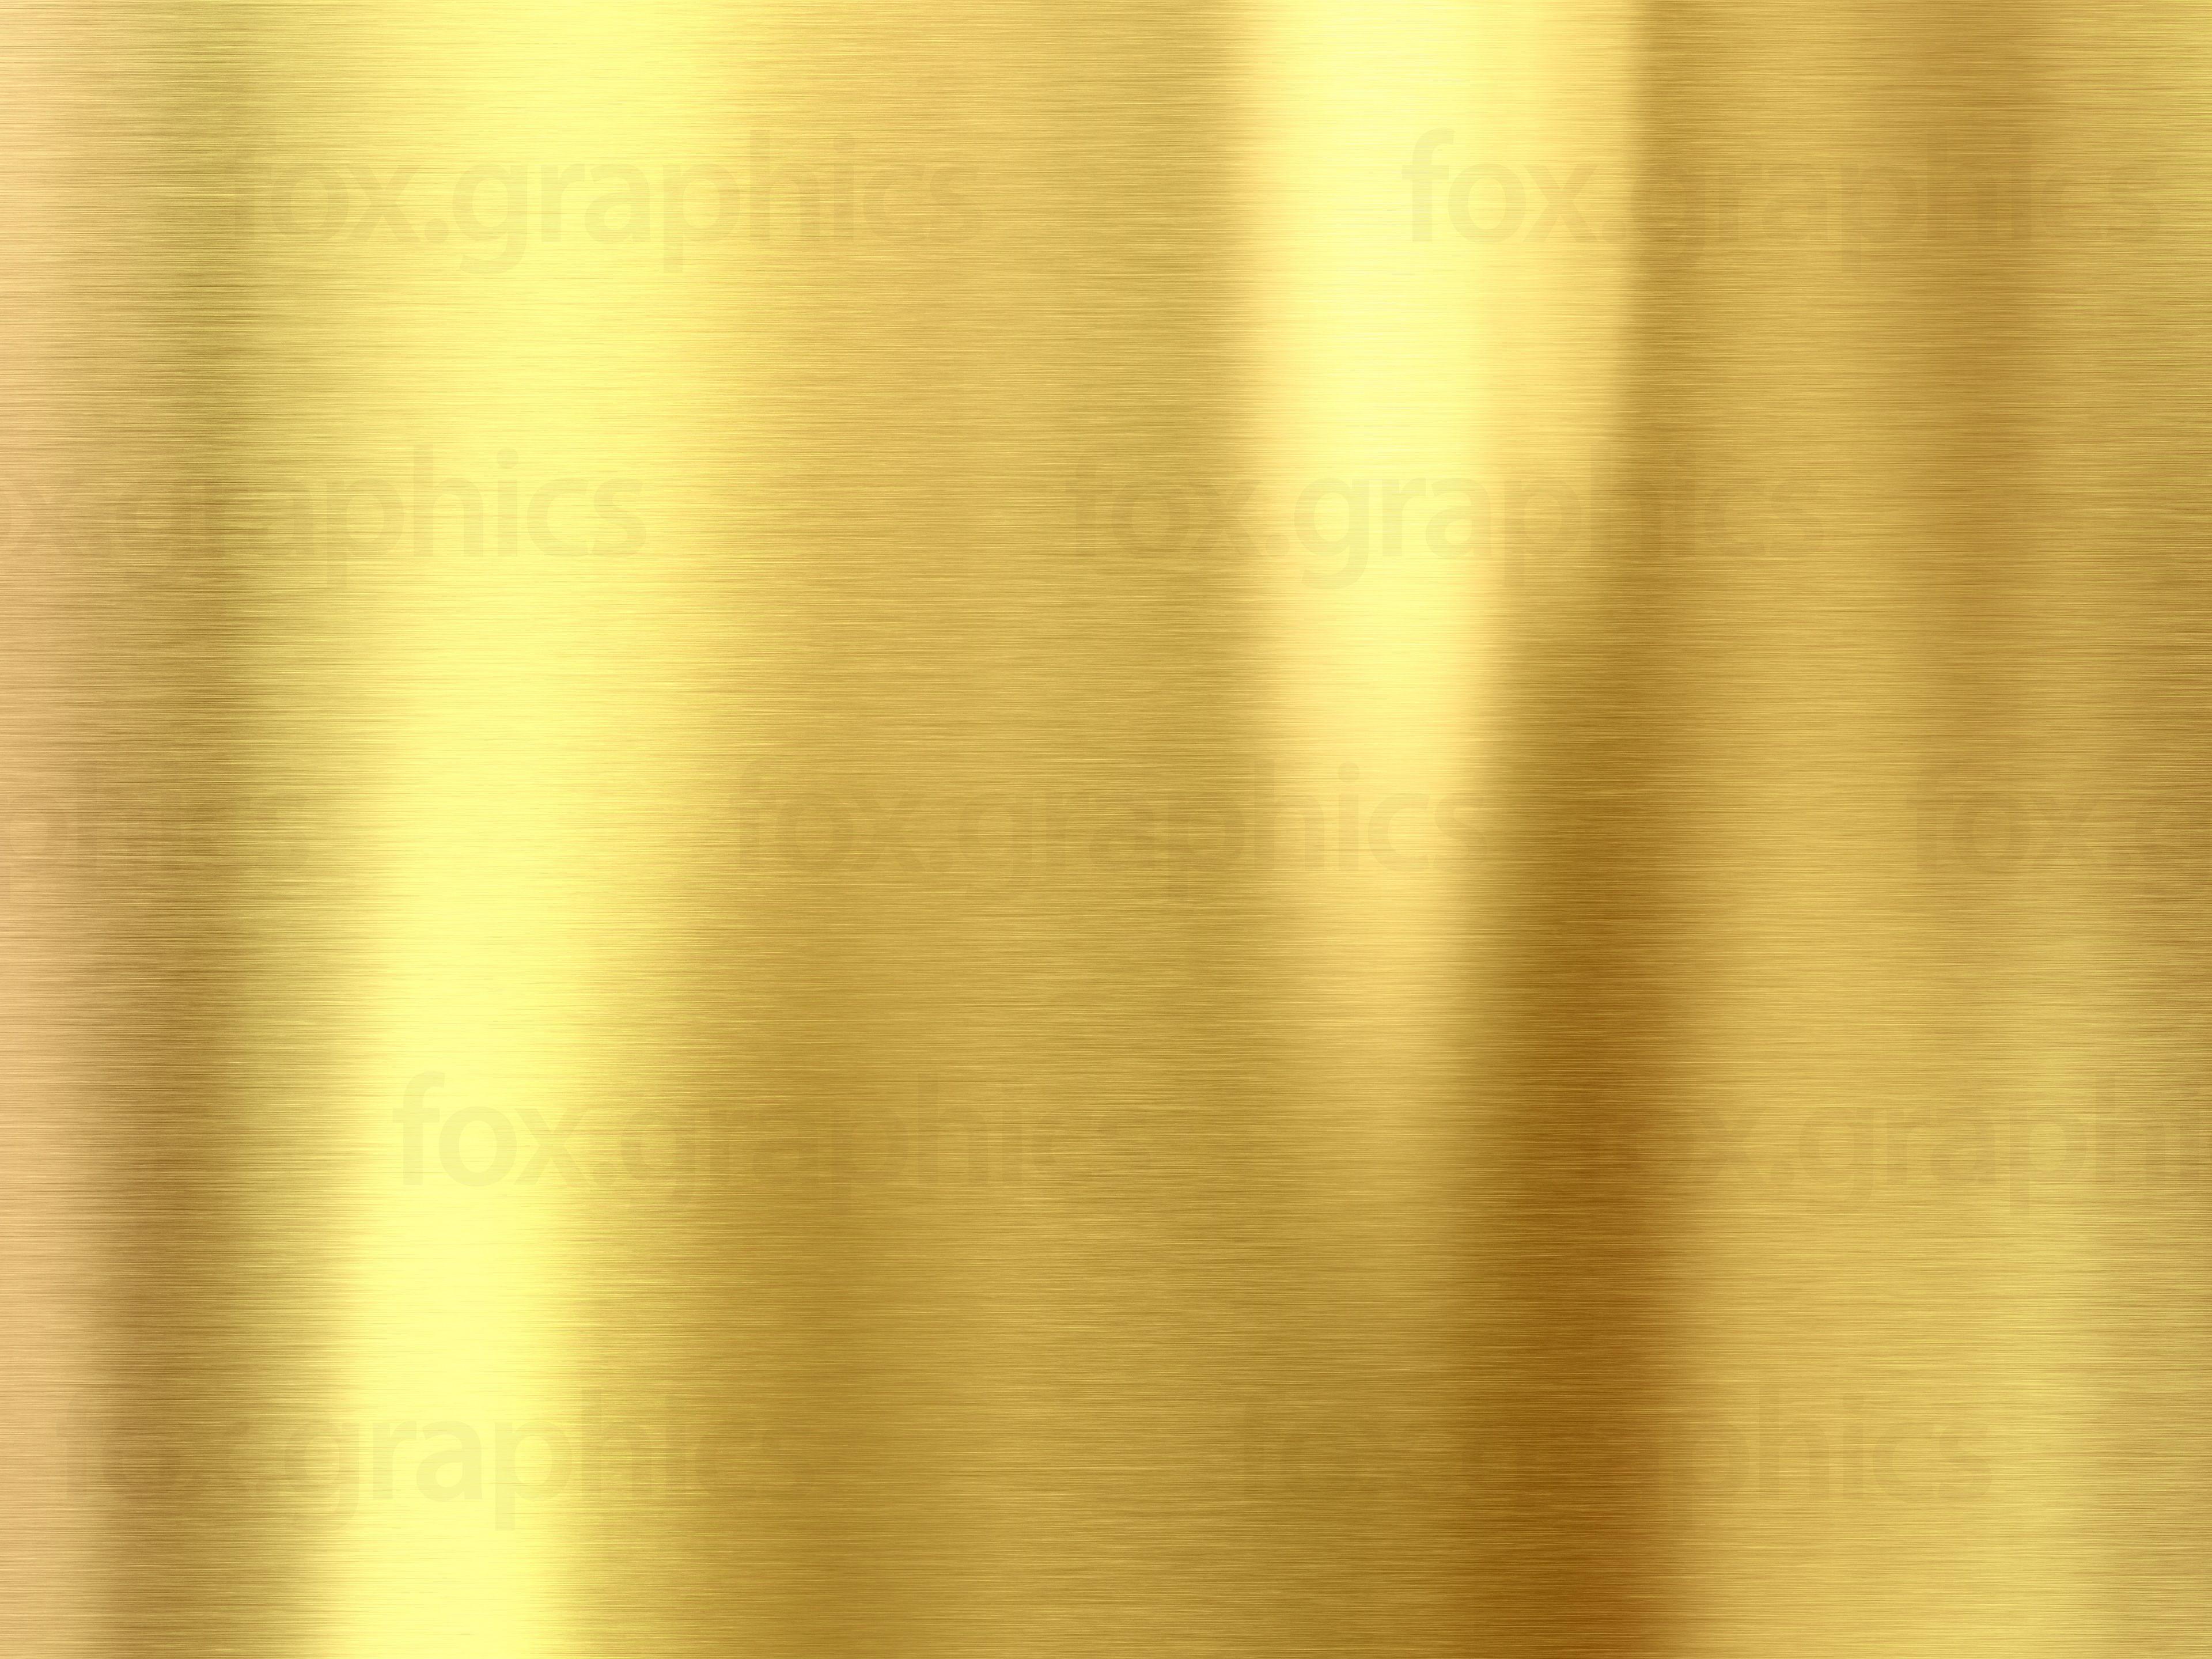 shiny metal textures - Google Search | metals | Pinterest ...